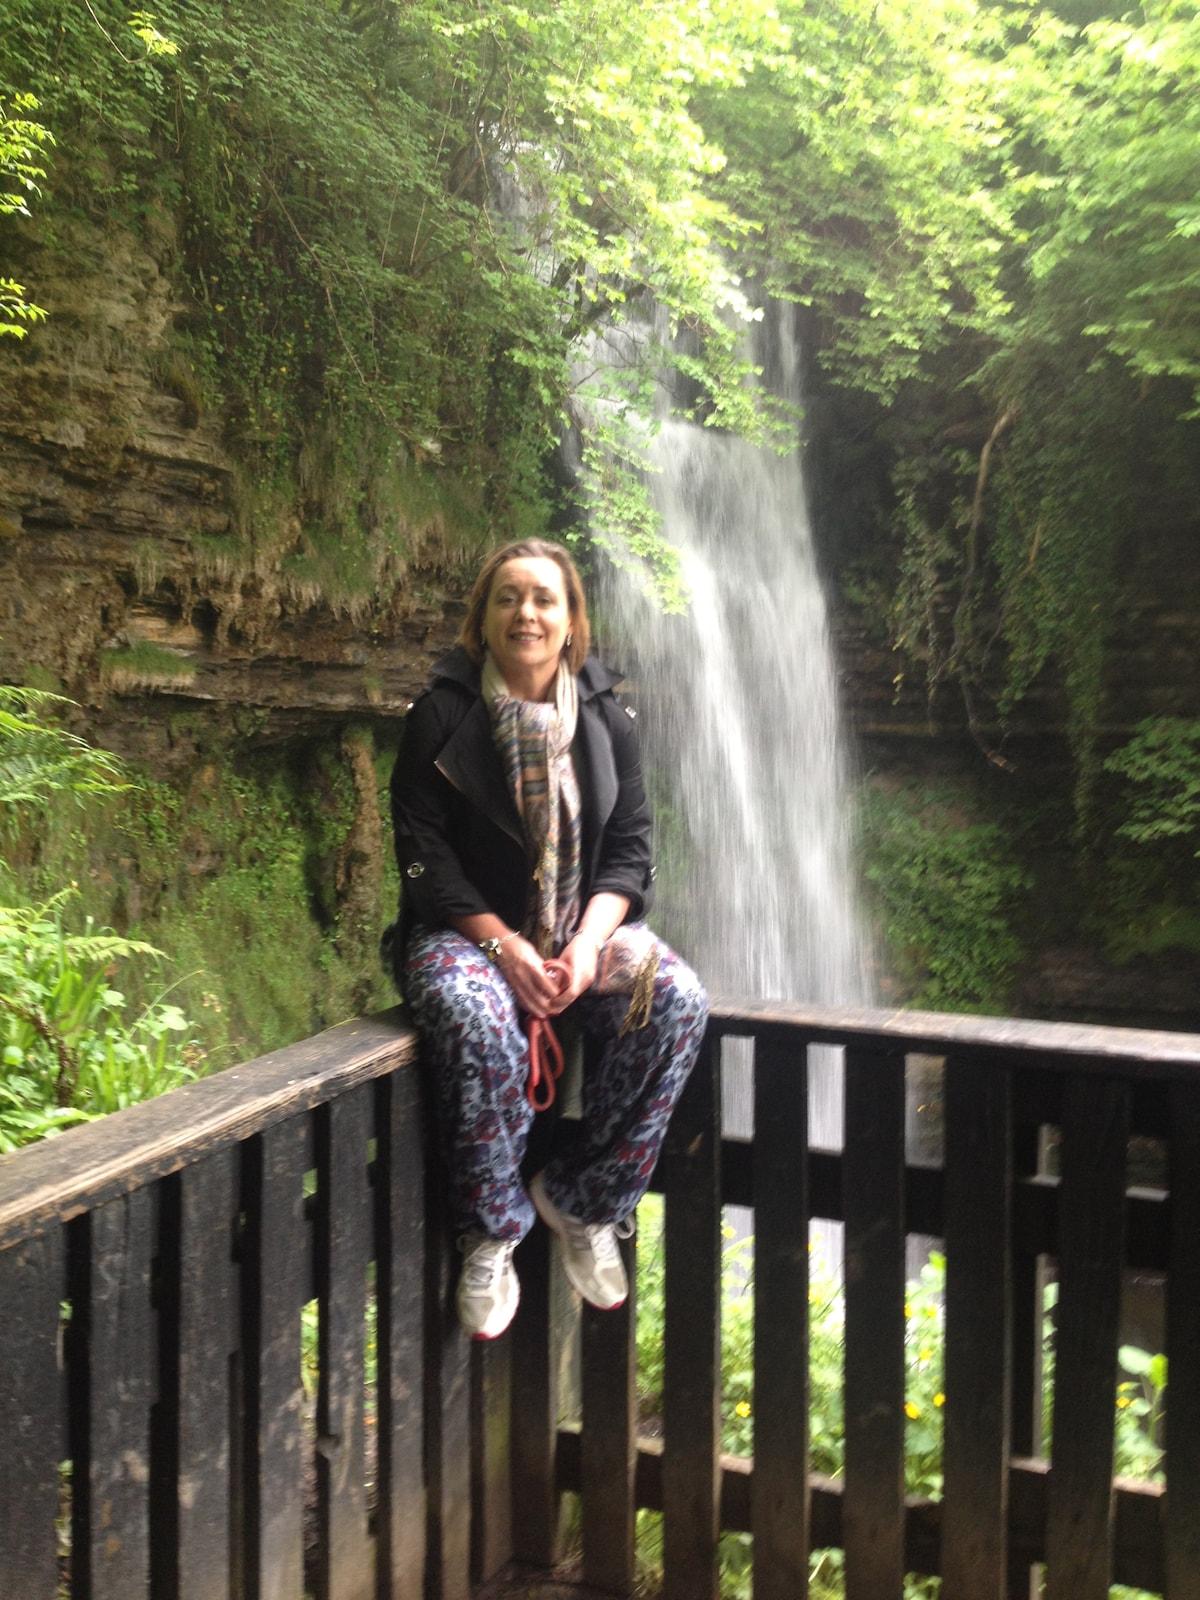 Amanda From Donegal, Ireland